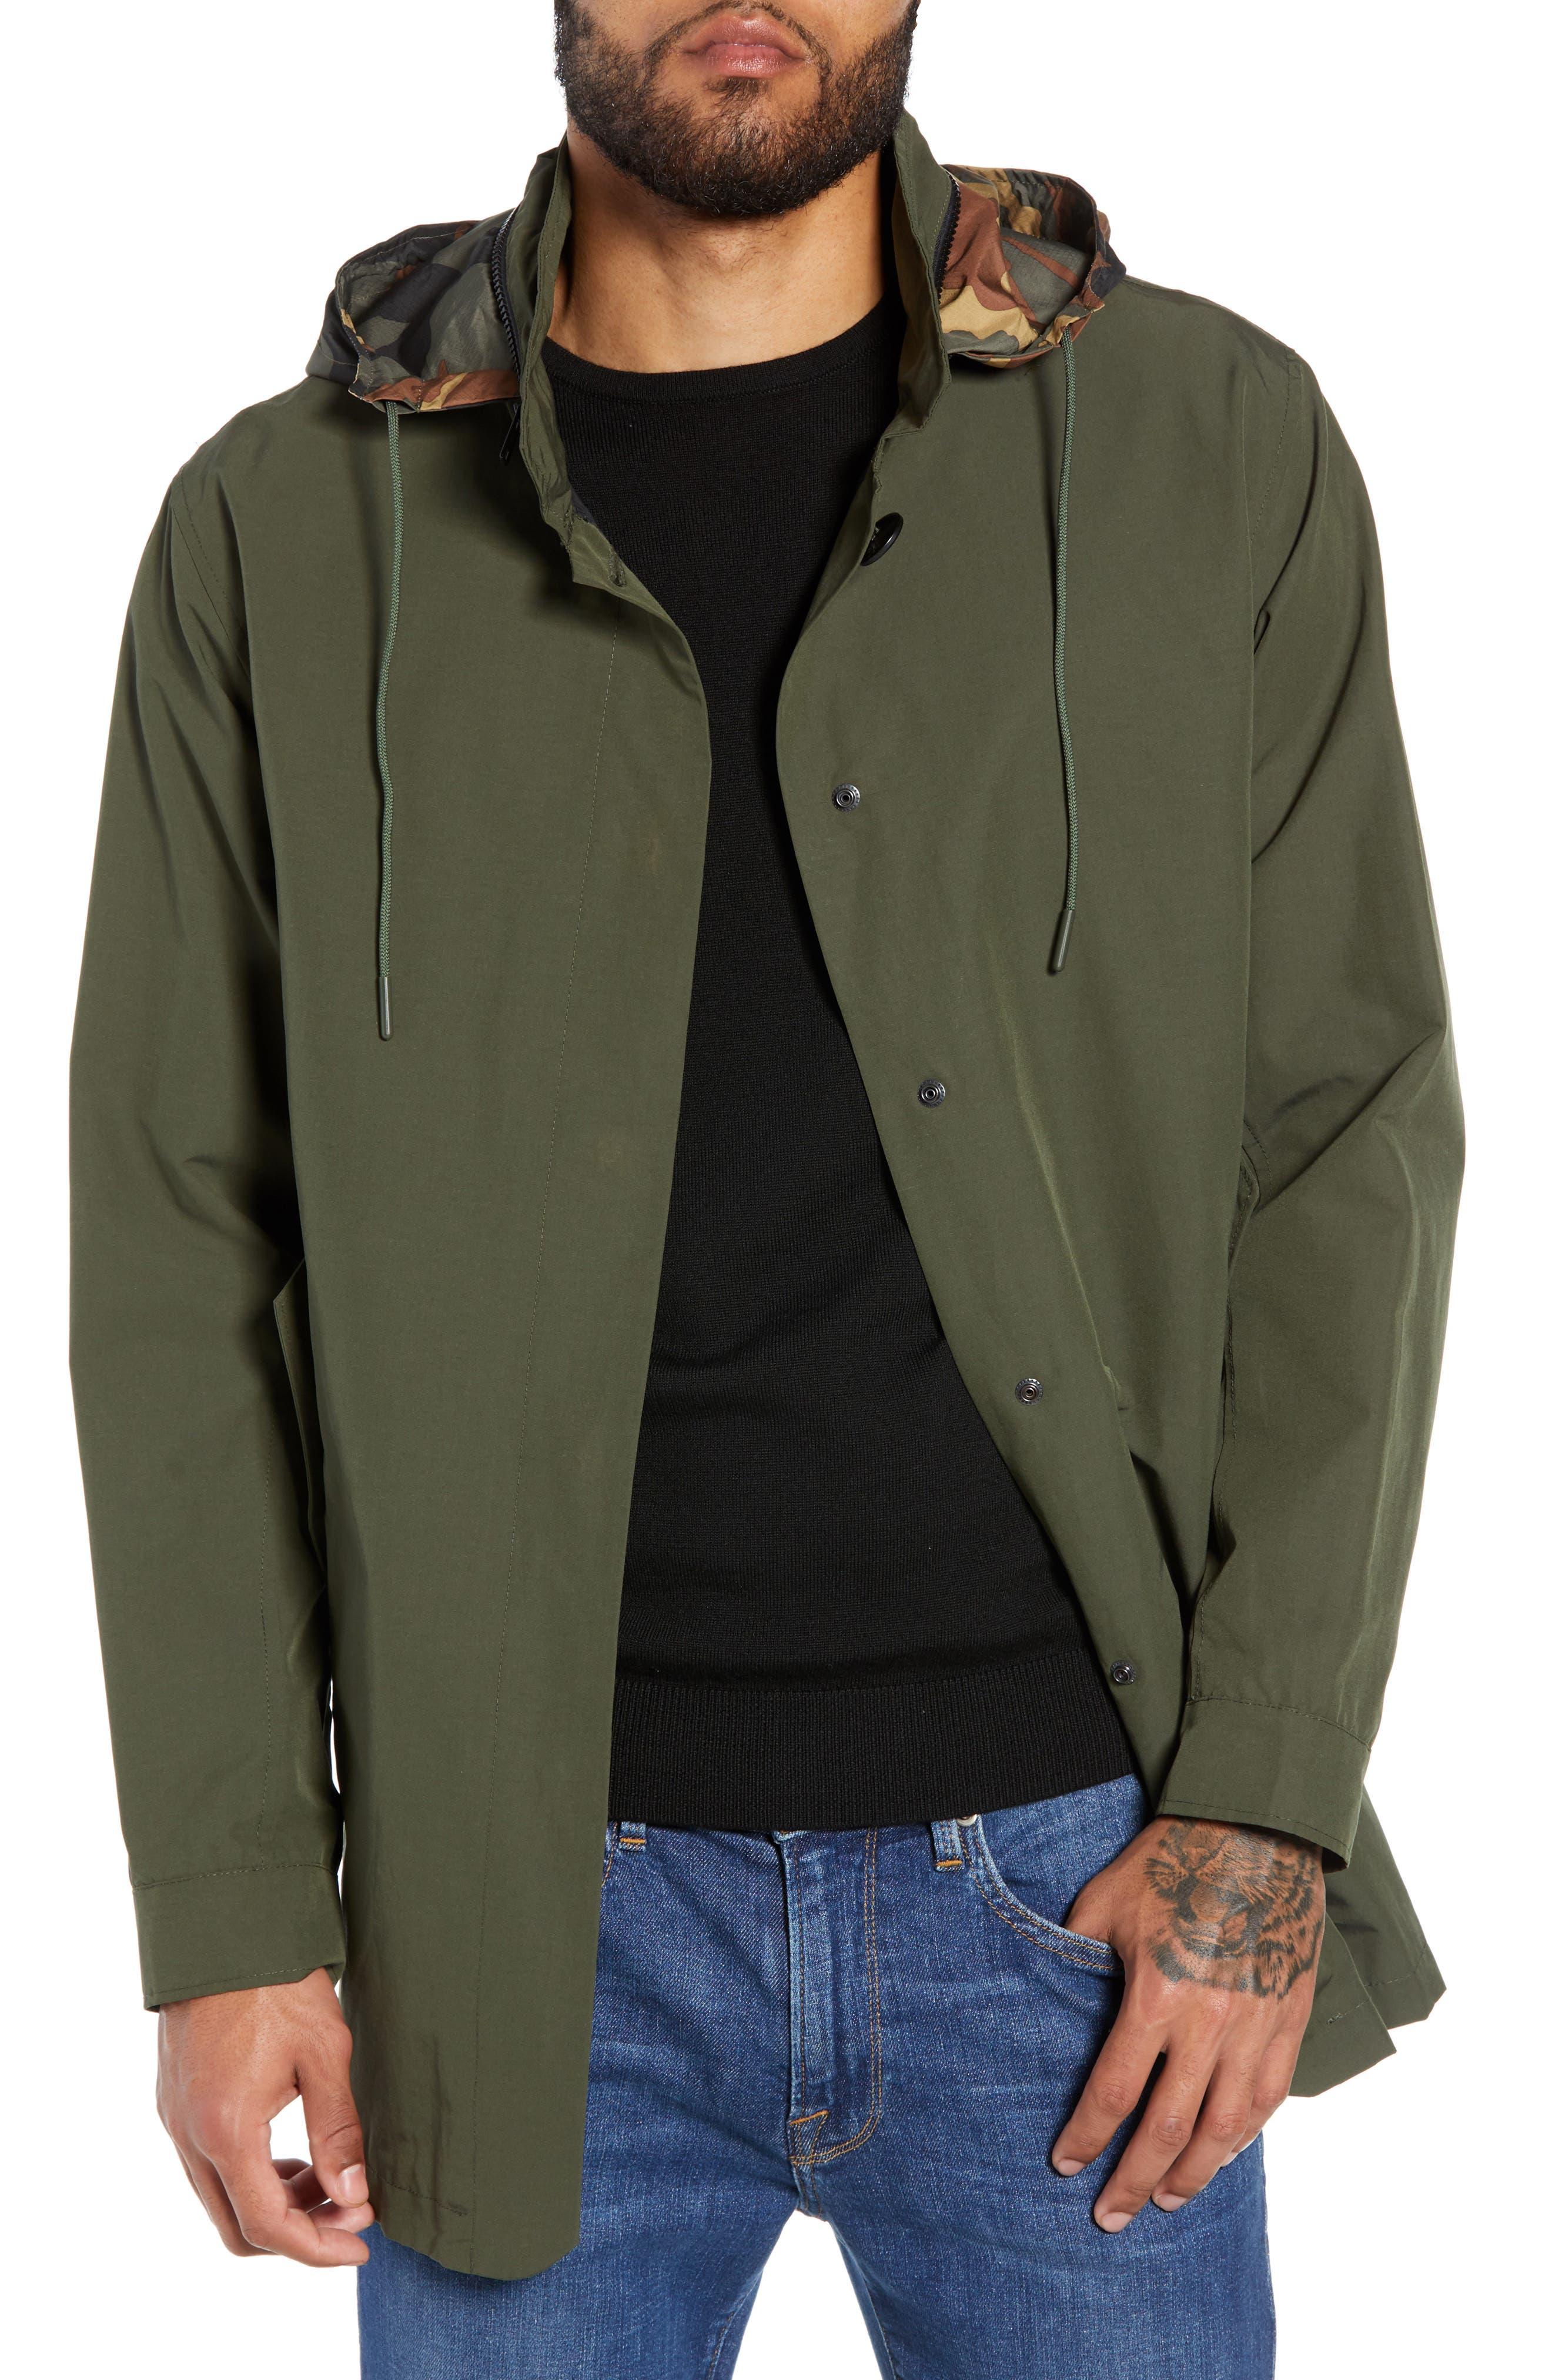 Stowaway Mac Jacket,                             Main thumbnail 1, color,                             306